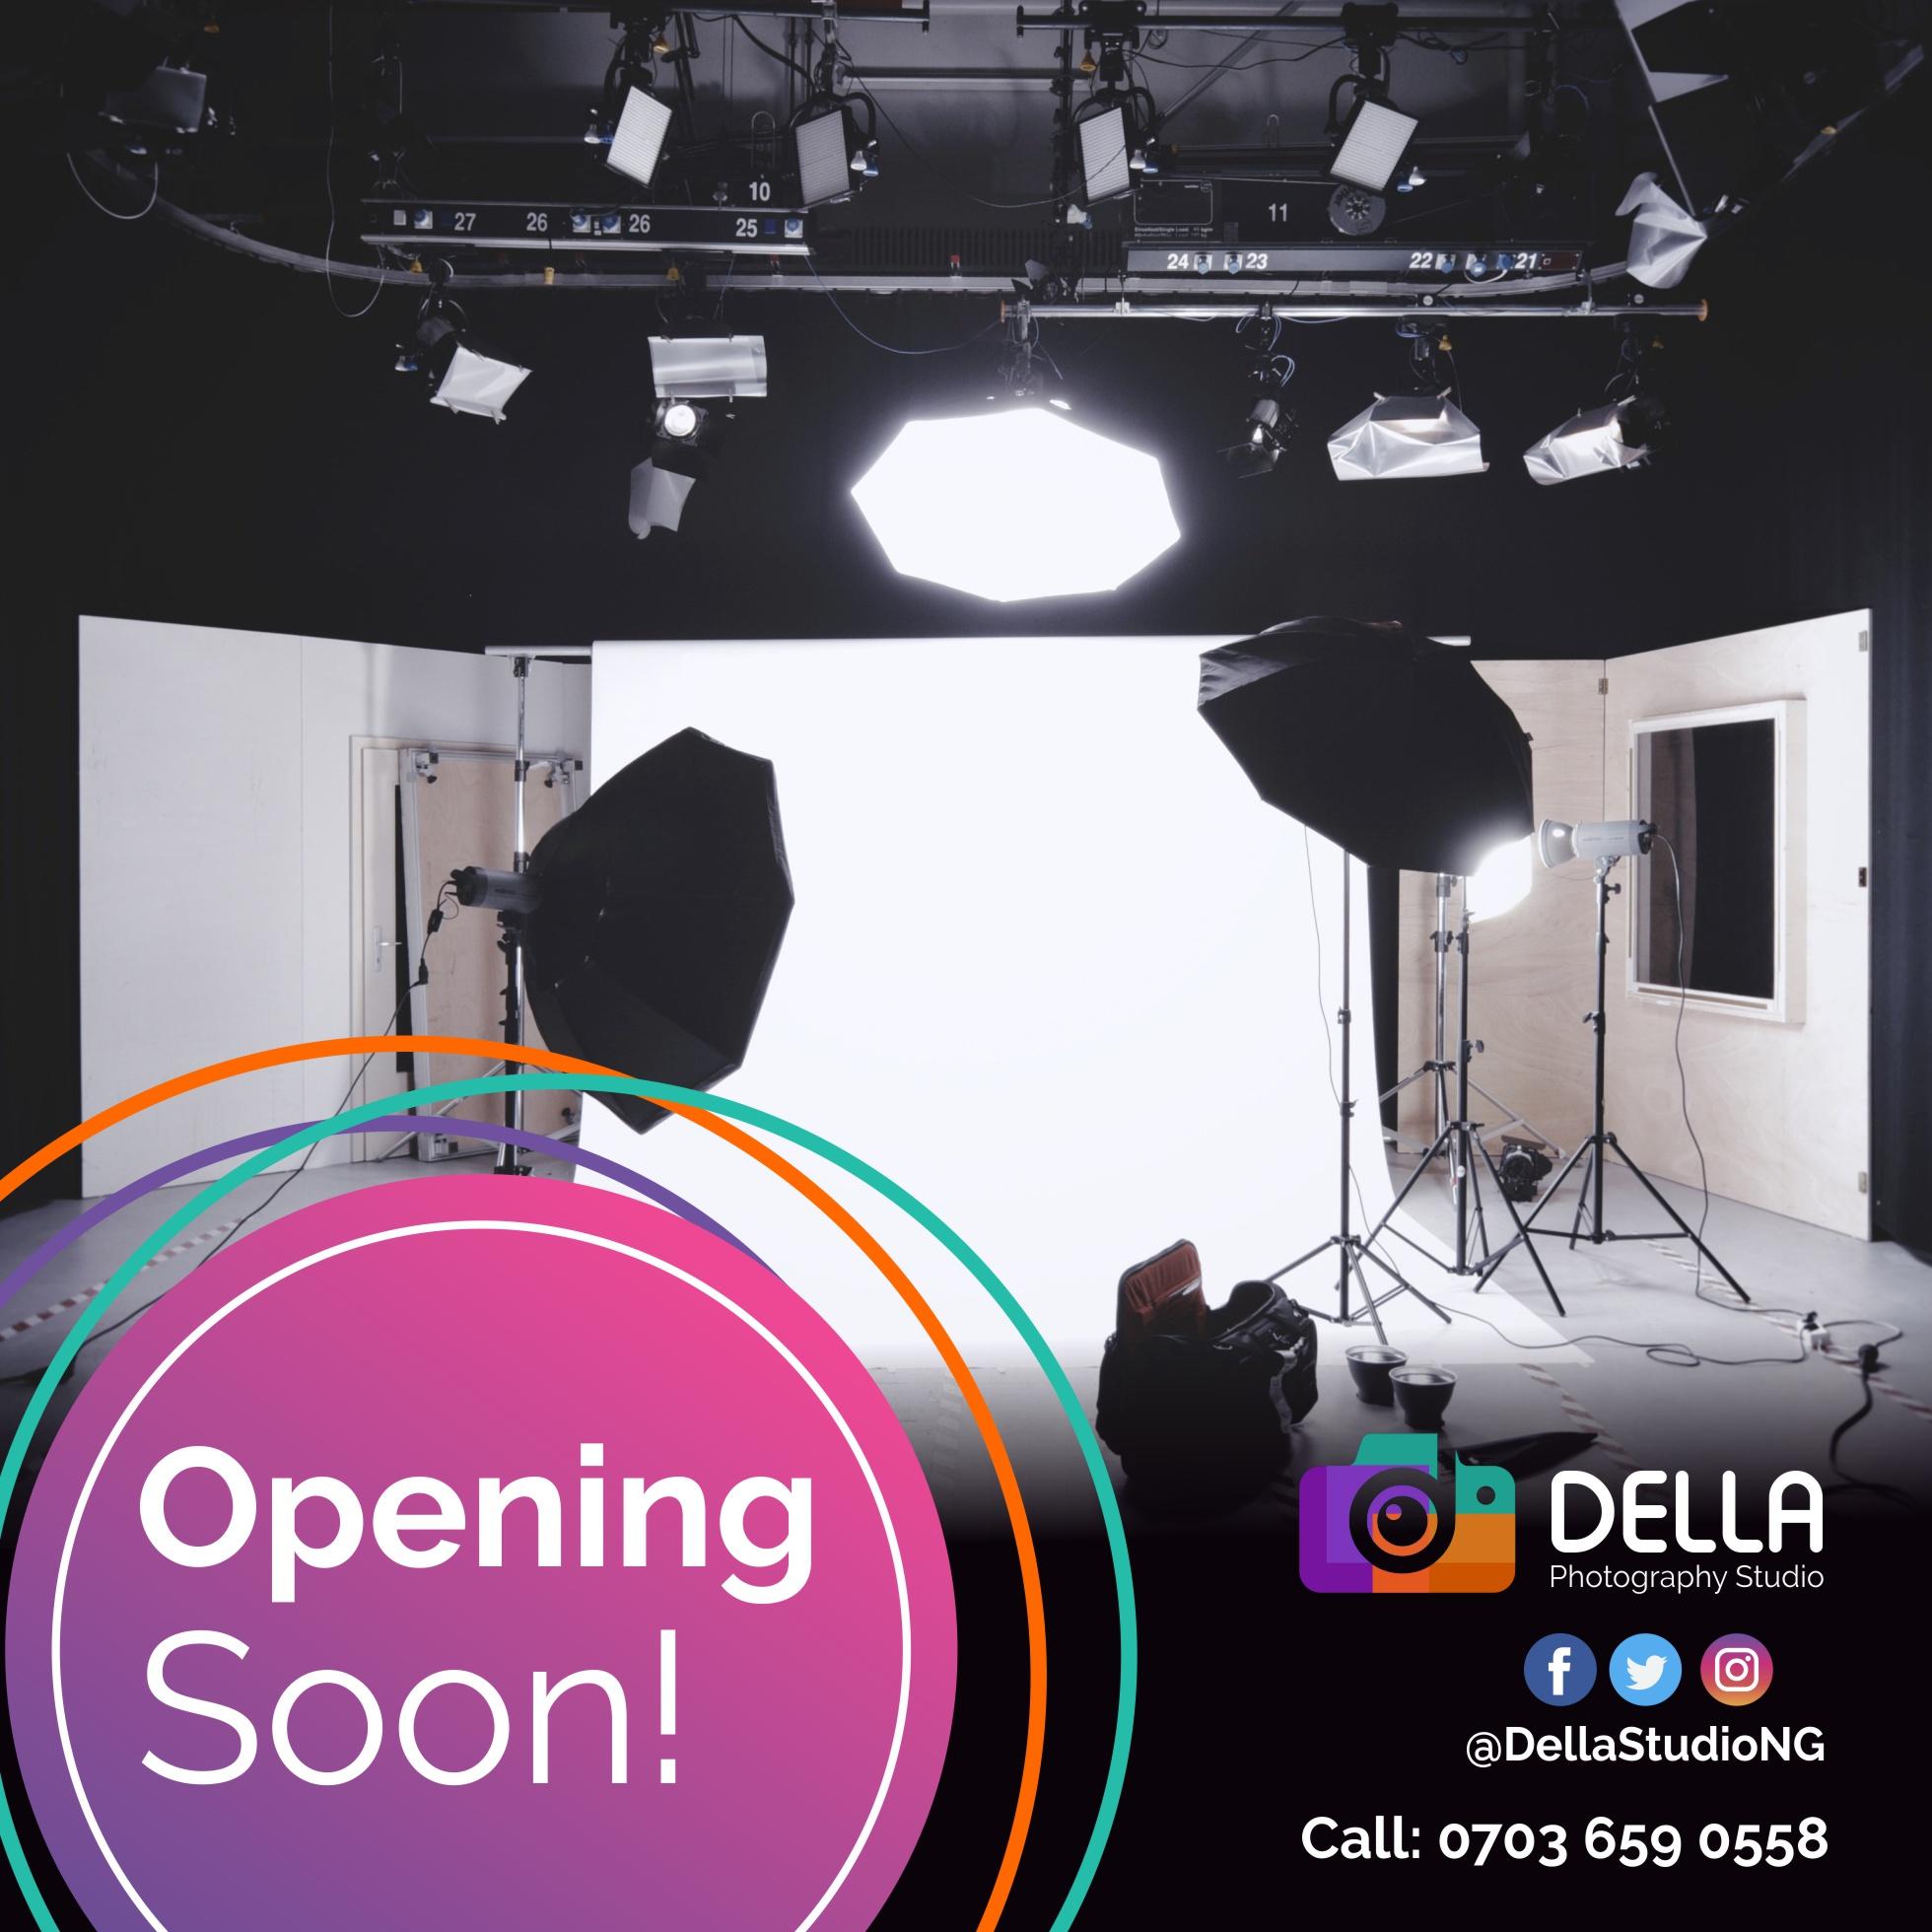 Della Opening